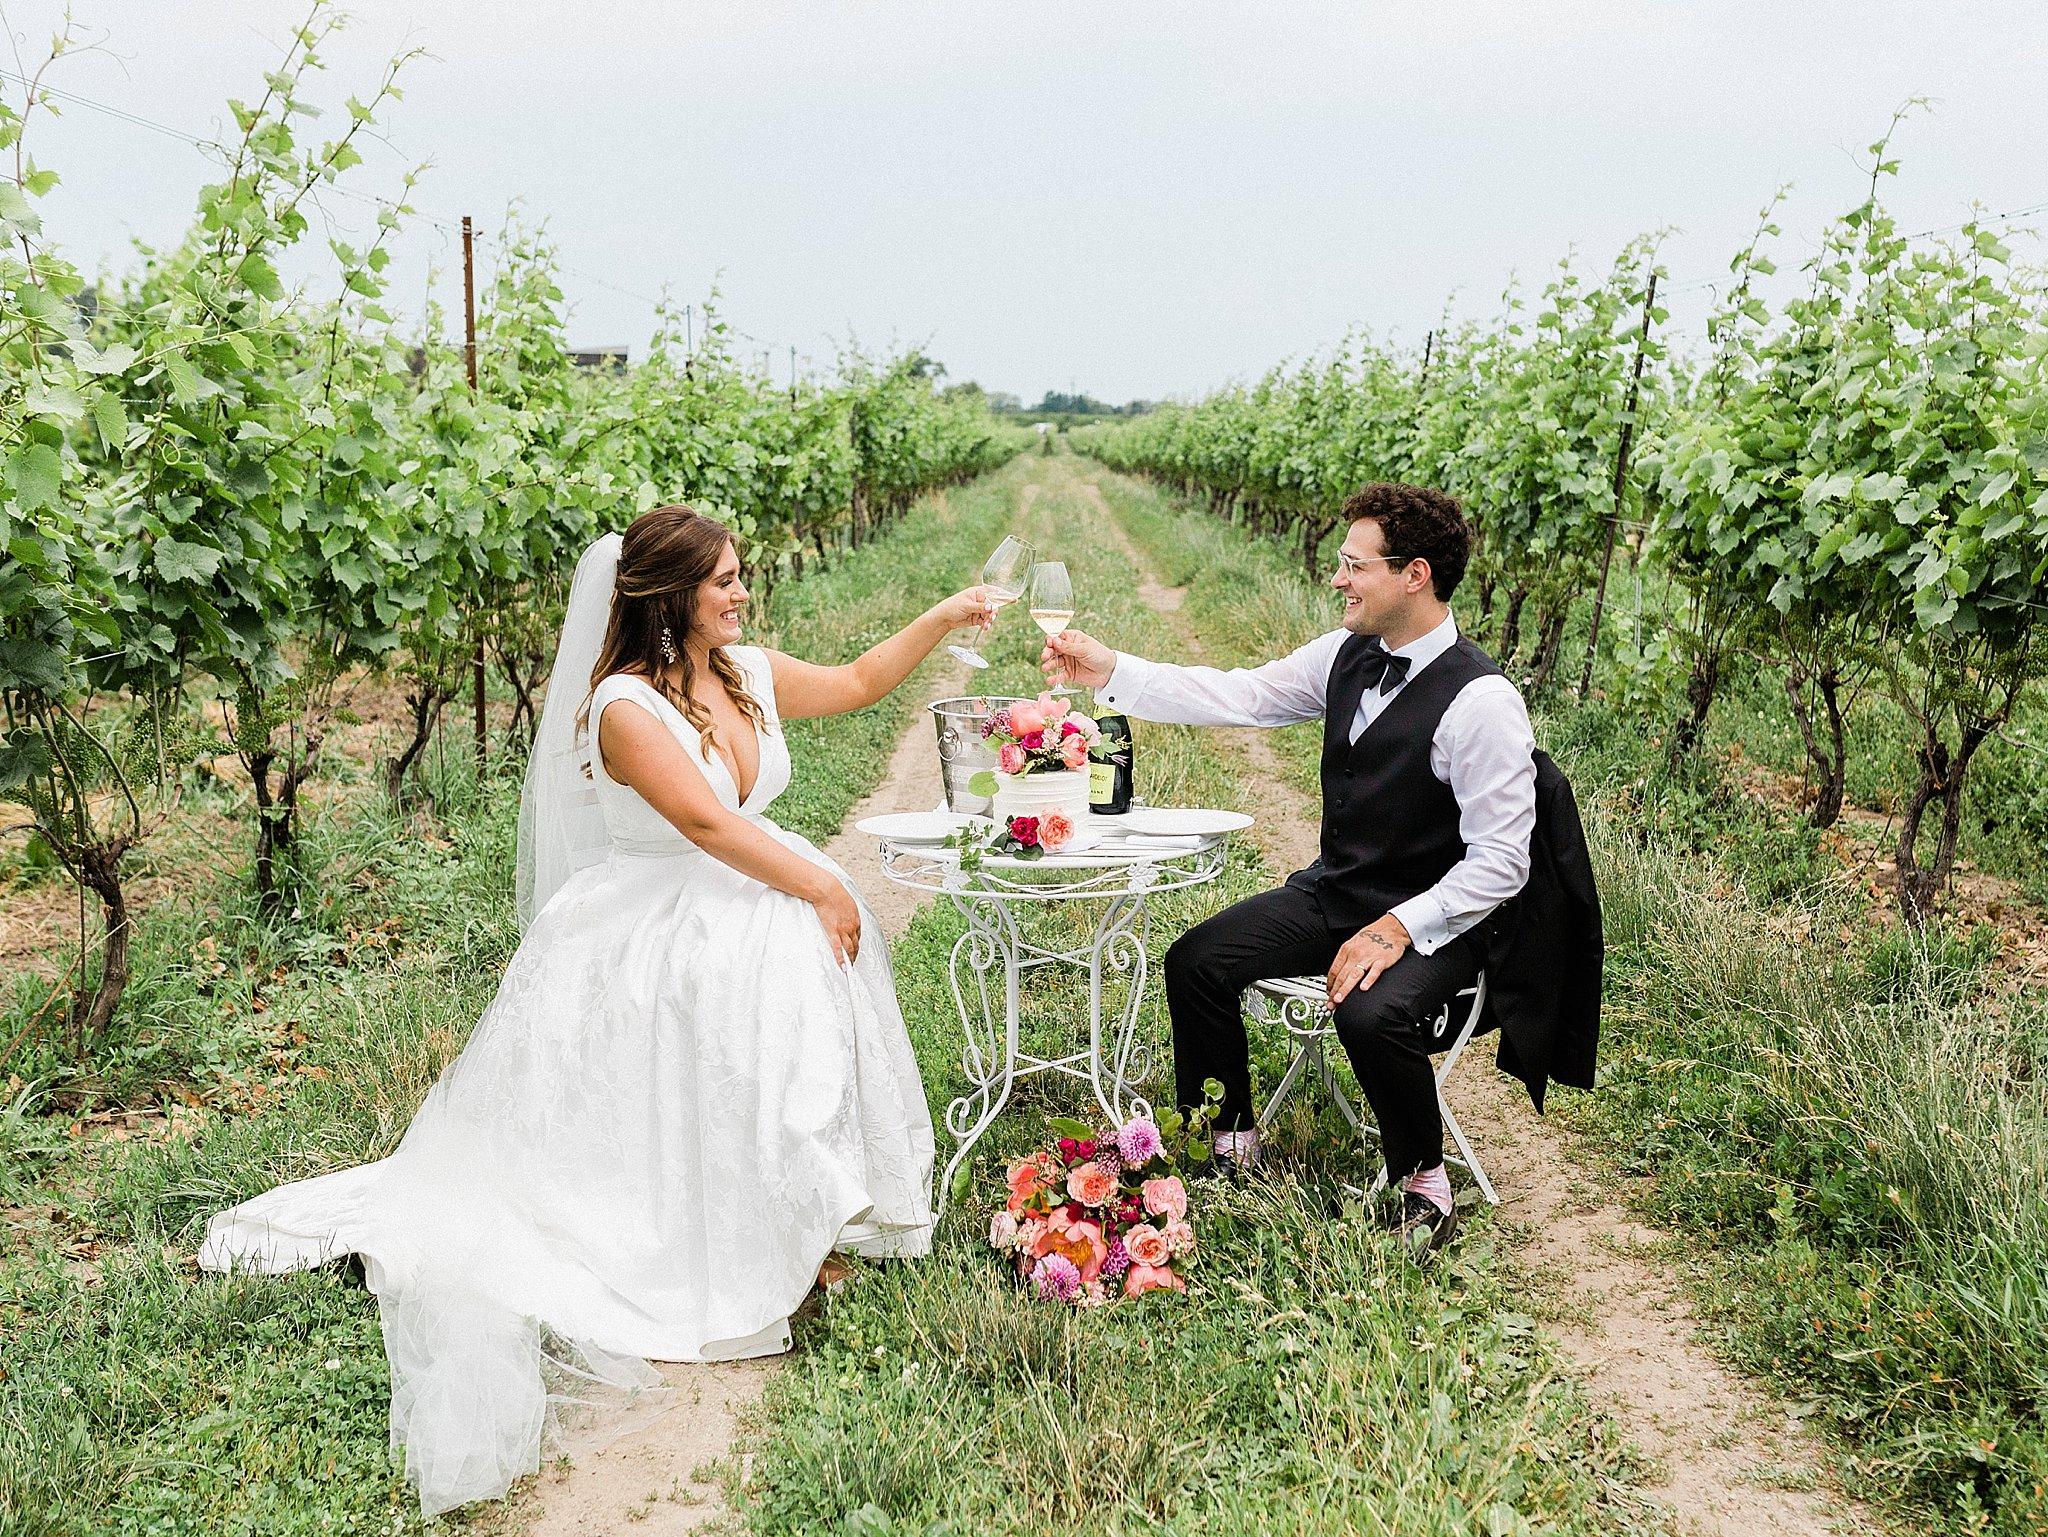 Niagara Falls Wedding Photographer, Toronto Wedding Photographer, Durham Region Wedding Photographer